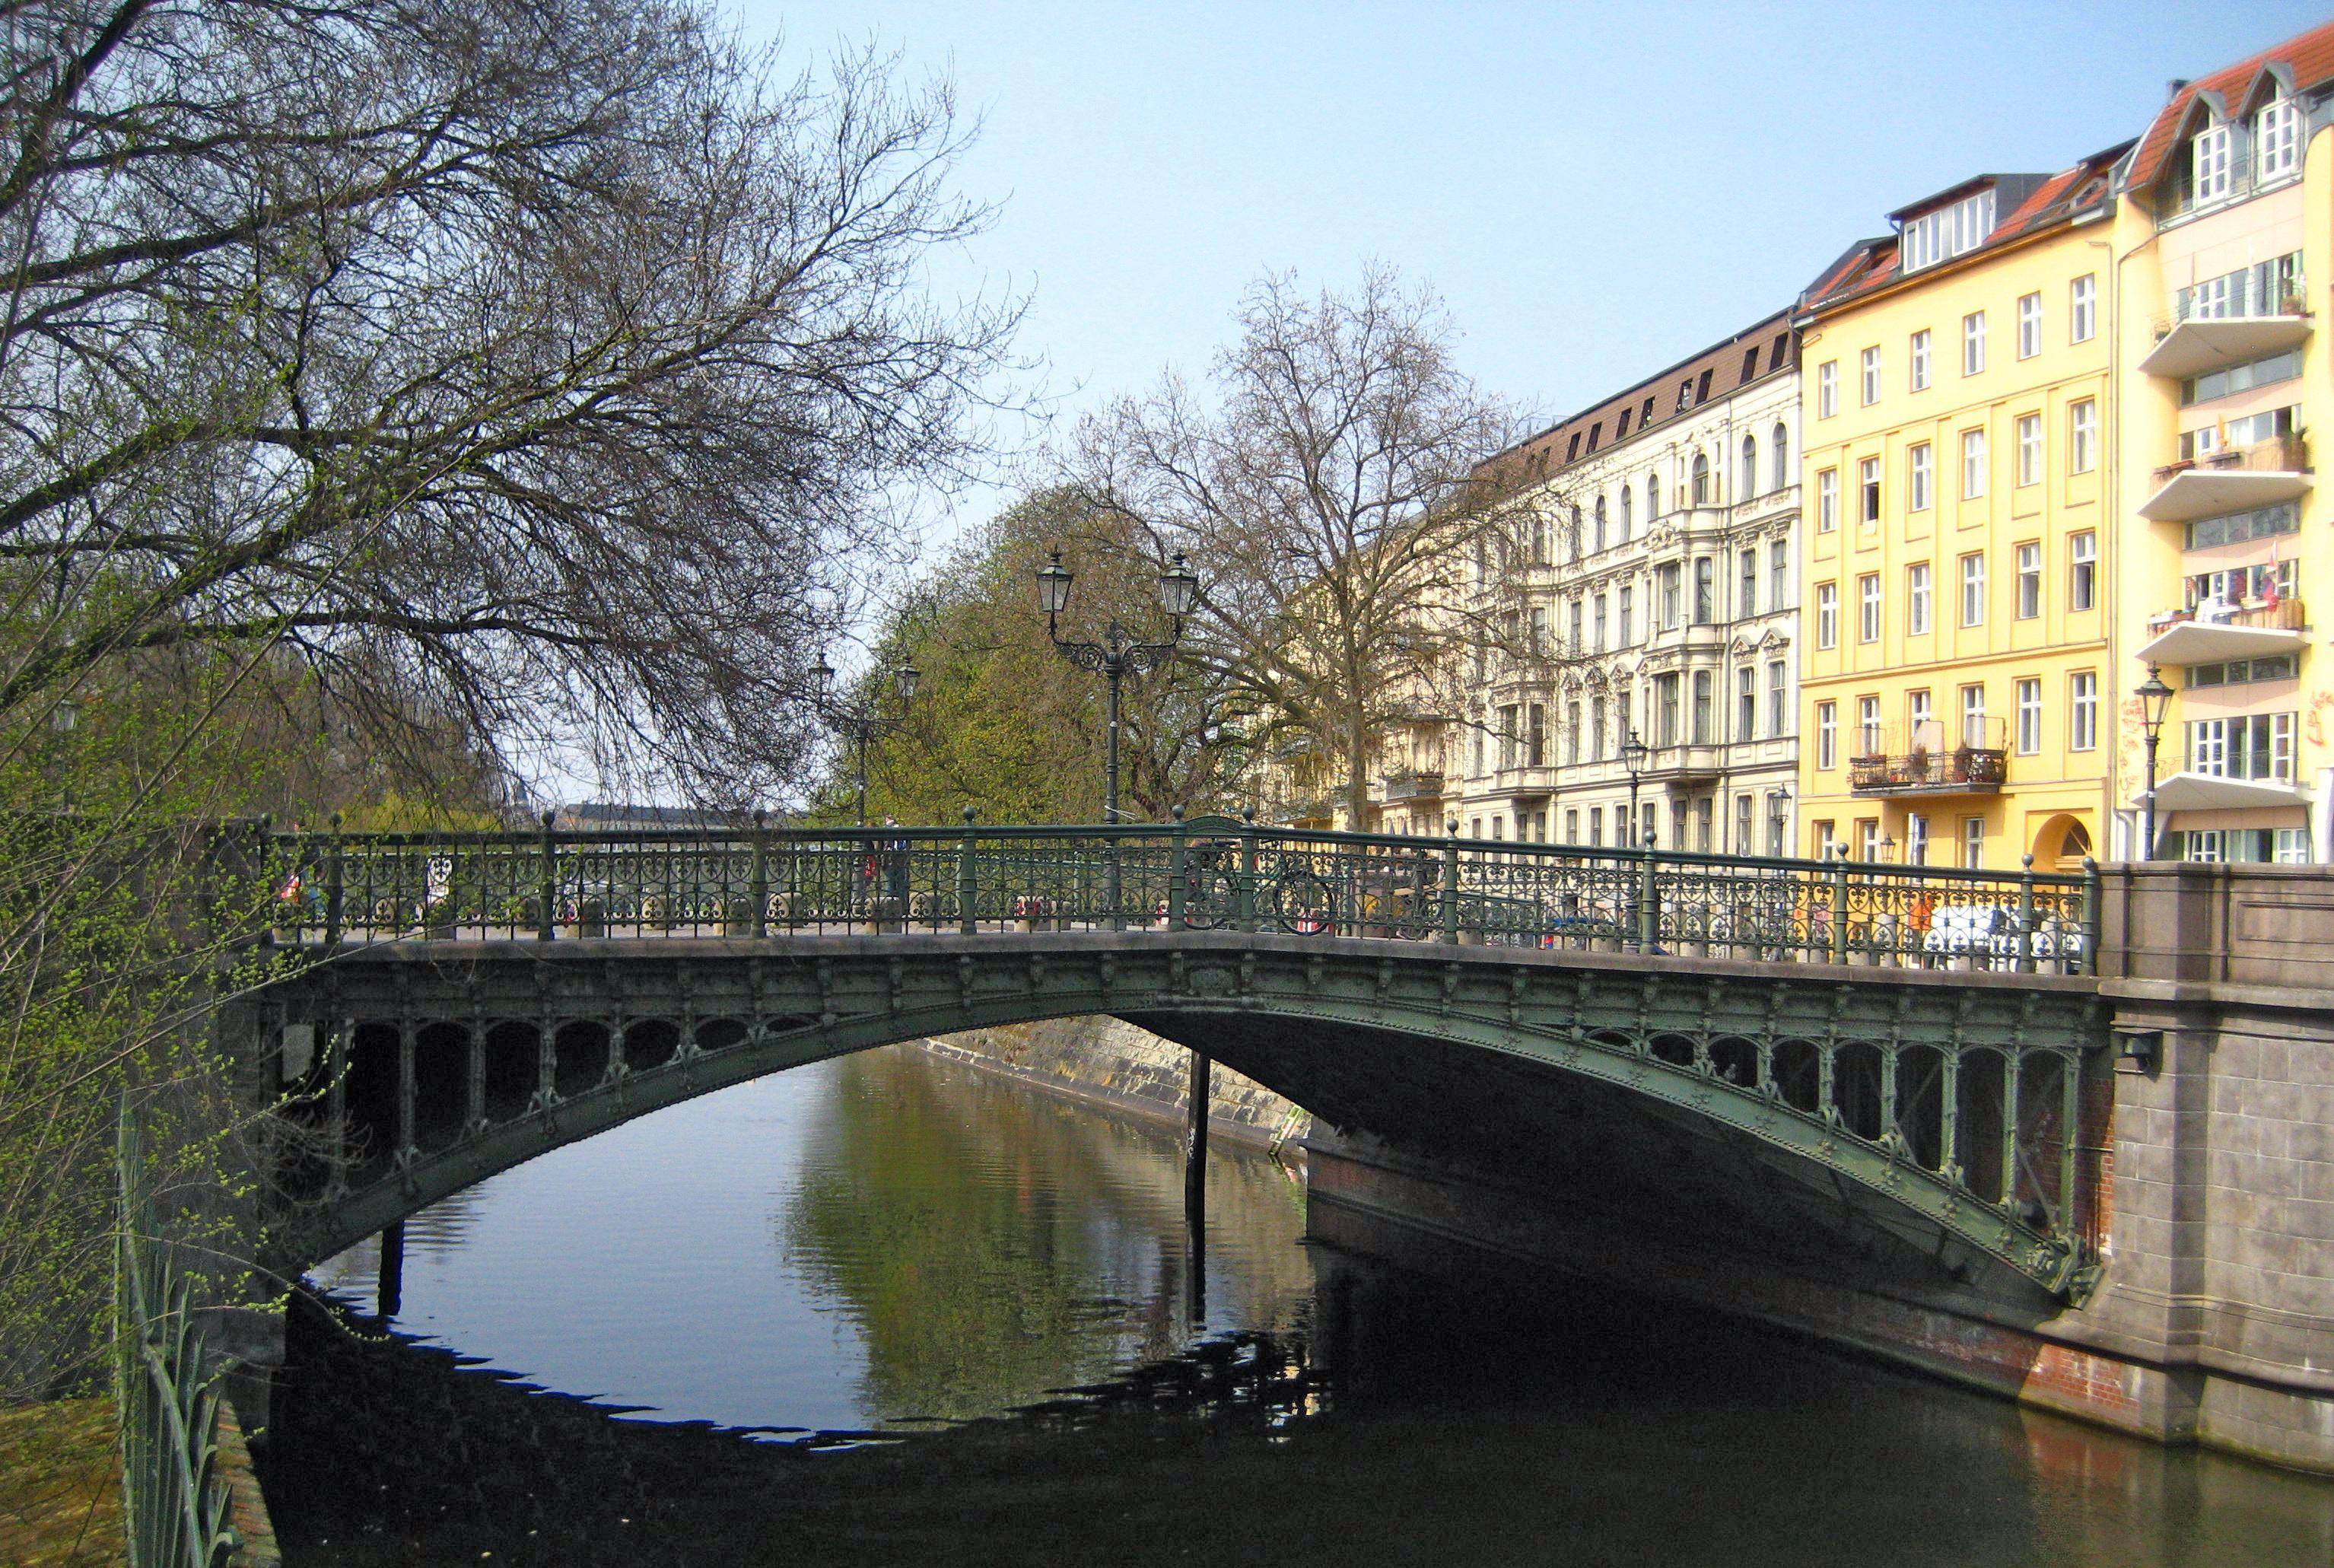 Berlin%2C_Admiralbr%C3%BCcke.jpg